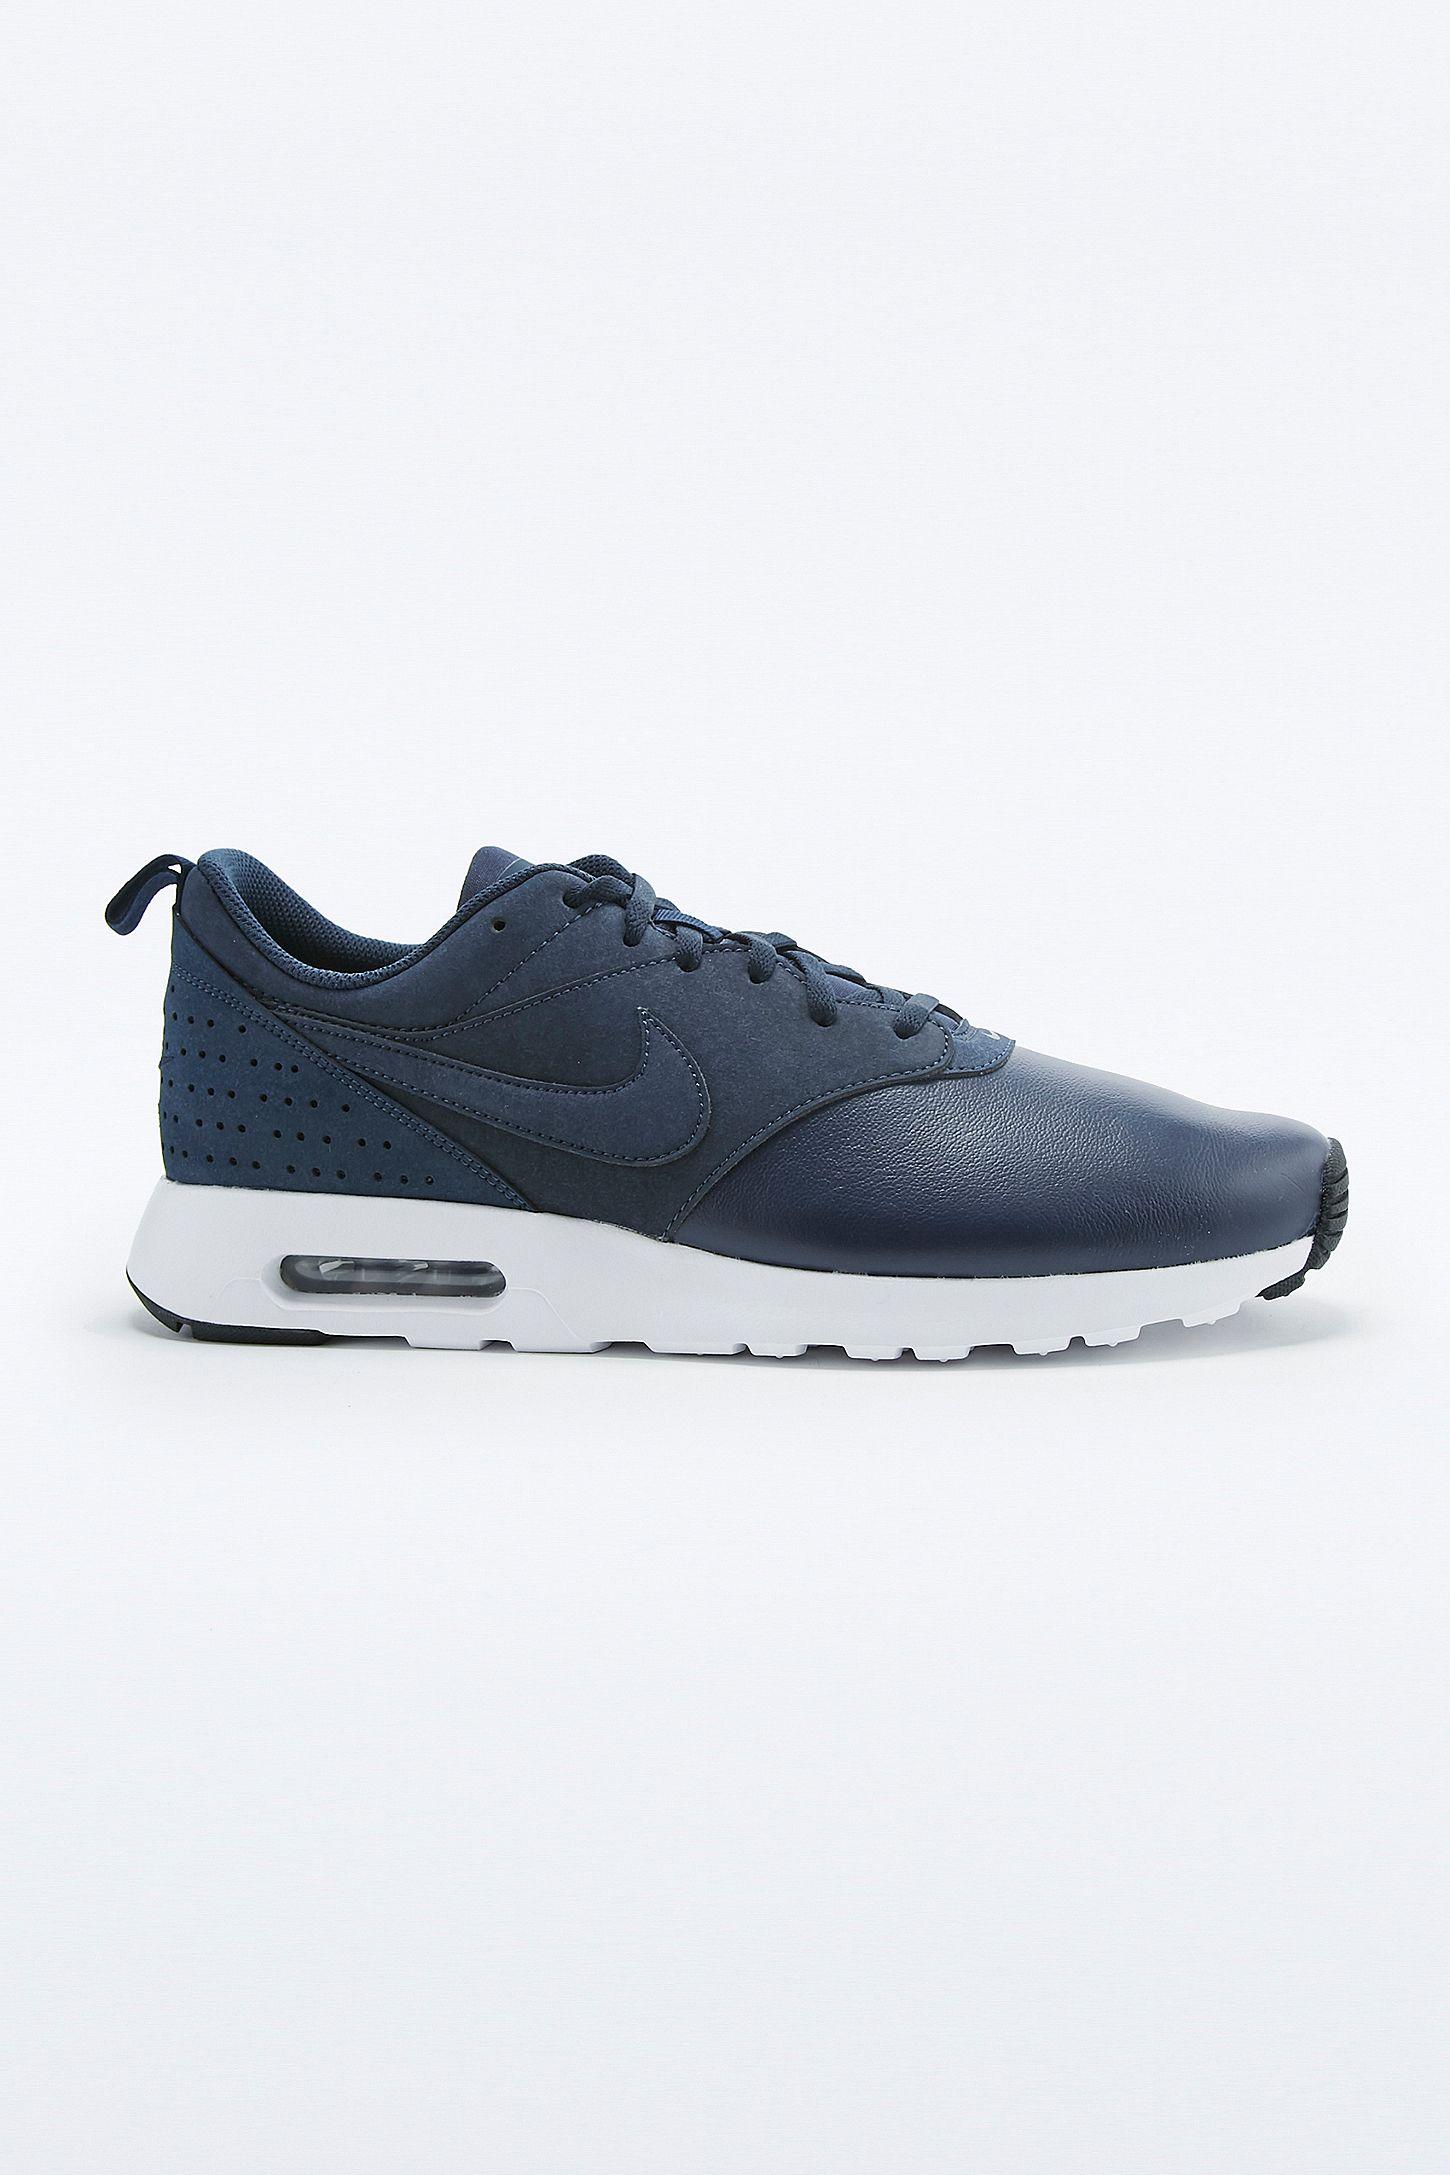 Nike Air Max Tavas Blue Leather Trainers